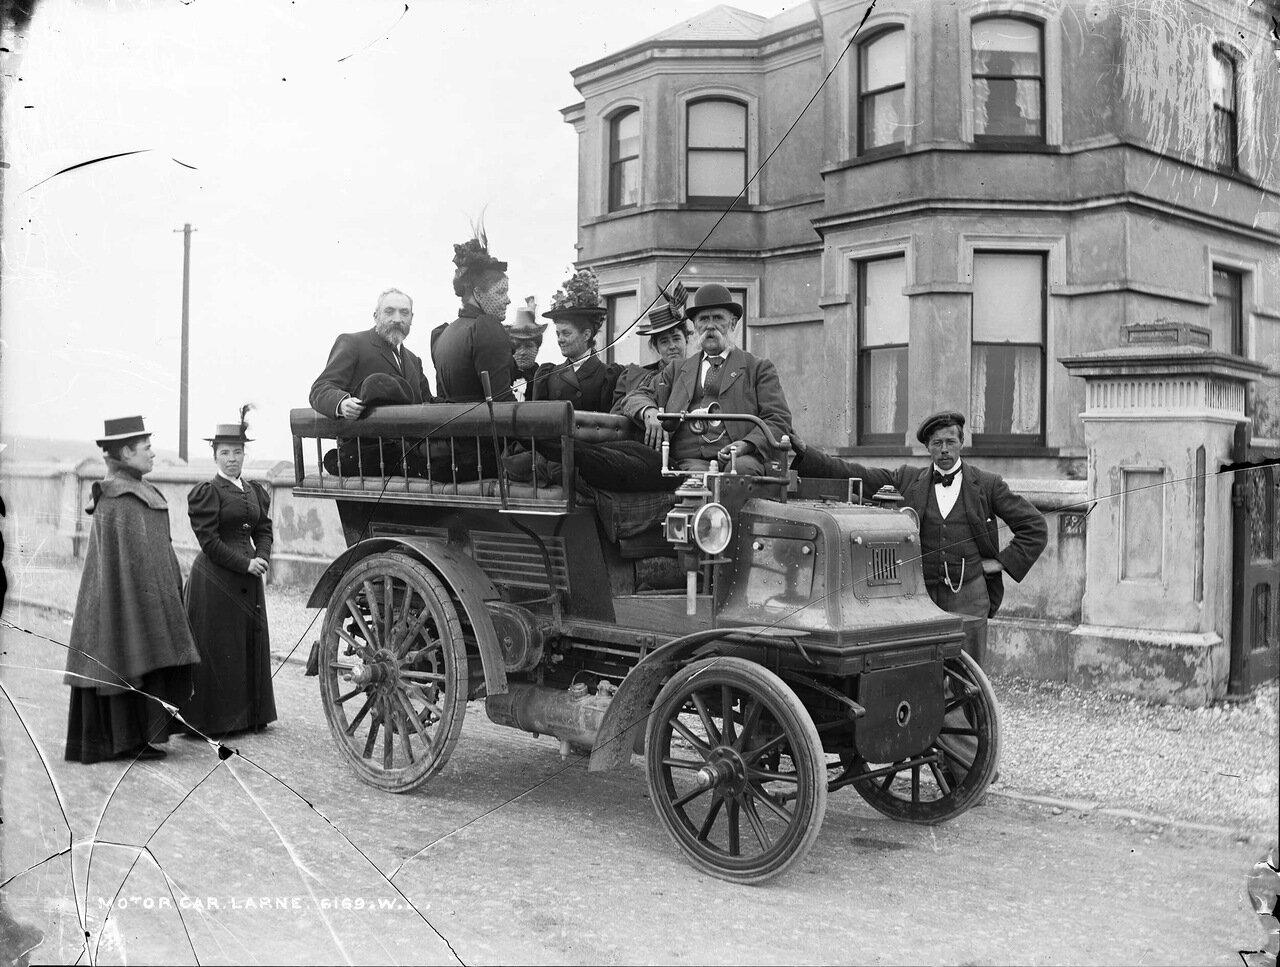 Автомобиль в Ларне, графство Антрим. 1899